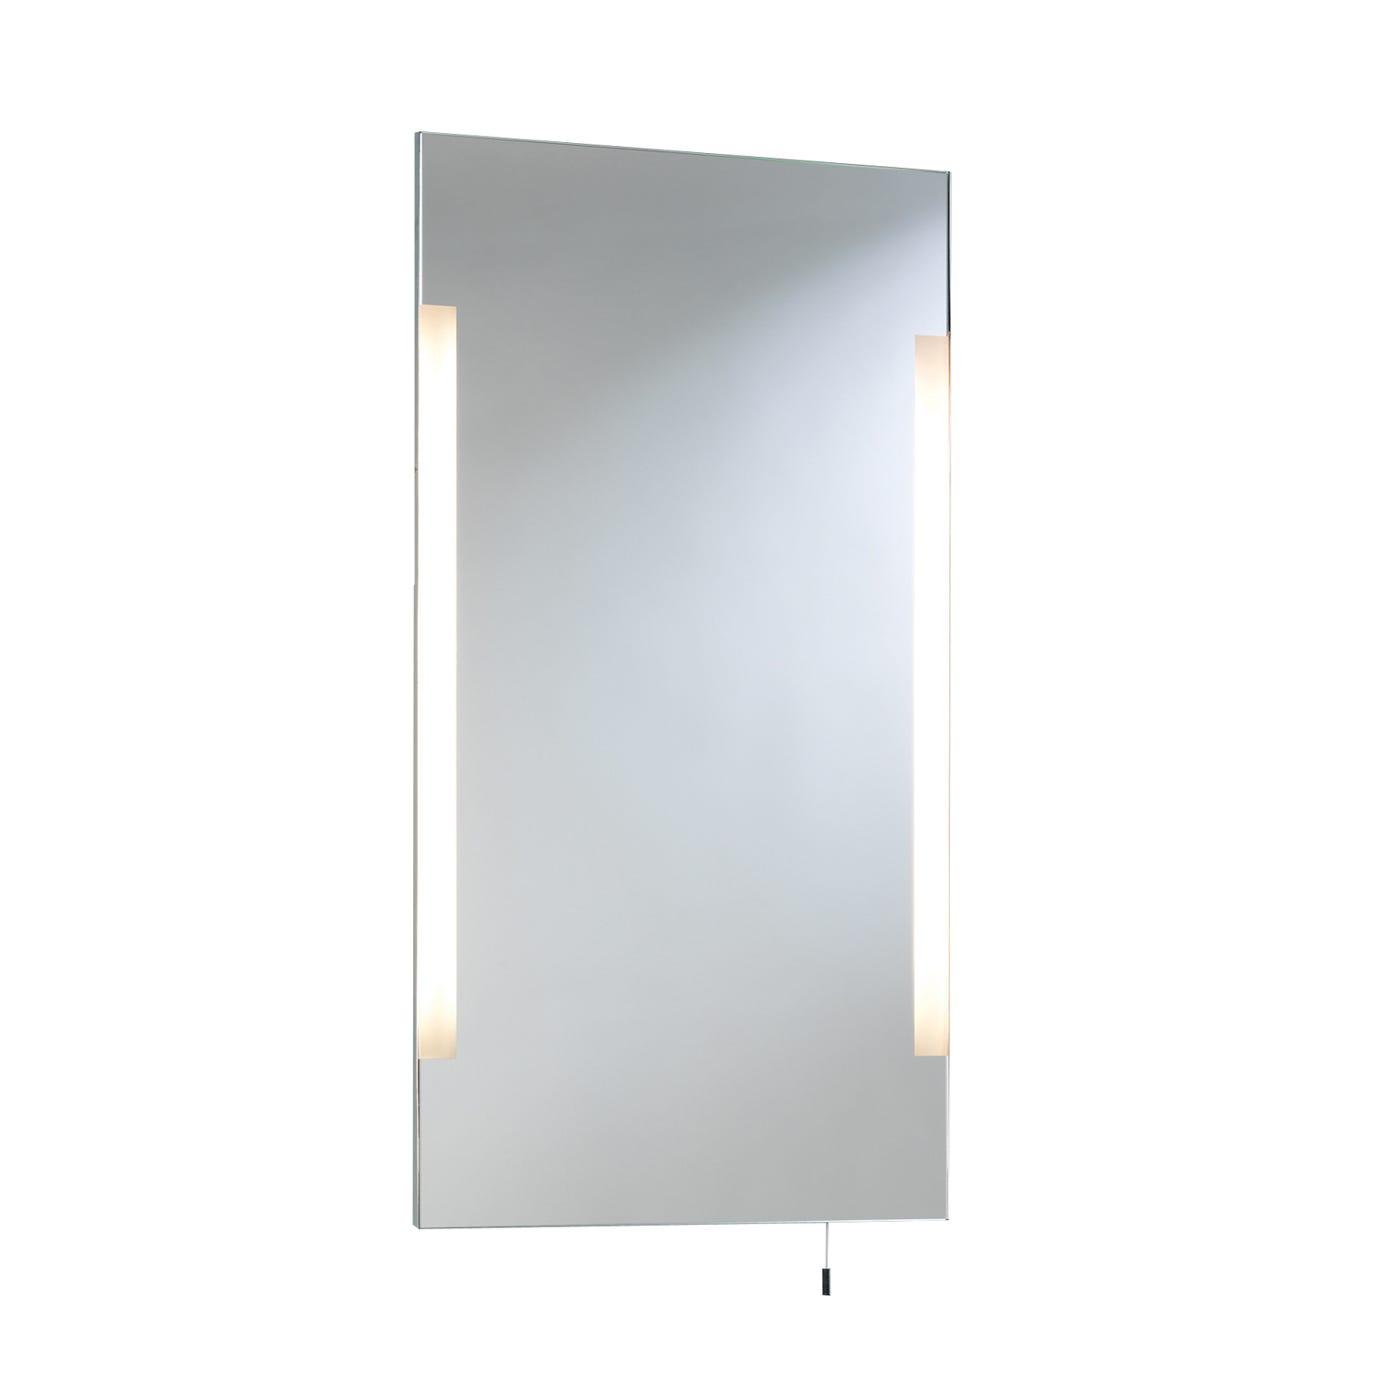 Heal 39 s imola tall illuminated bathroom mirror heal s for Illuminated mirrors